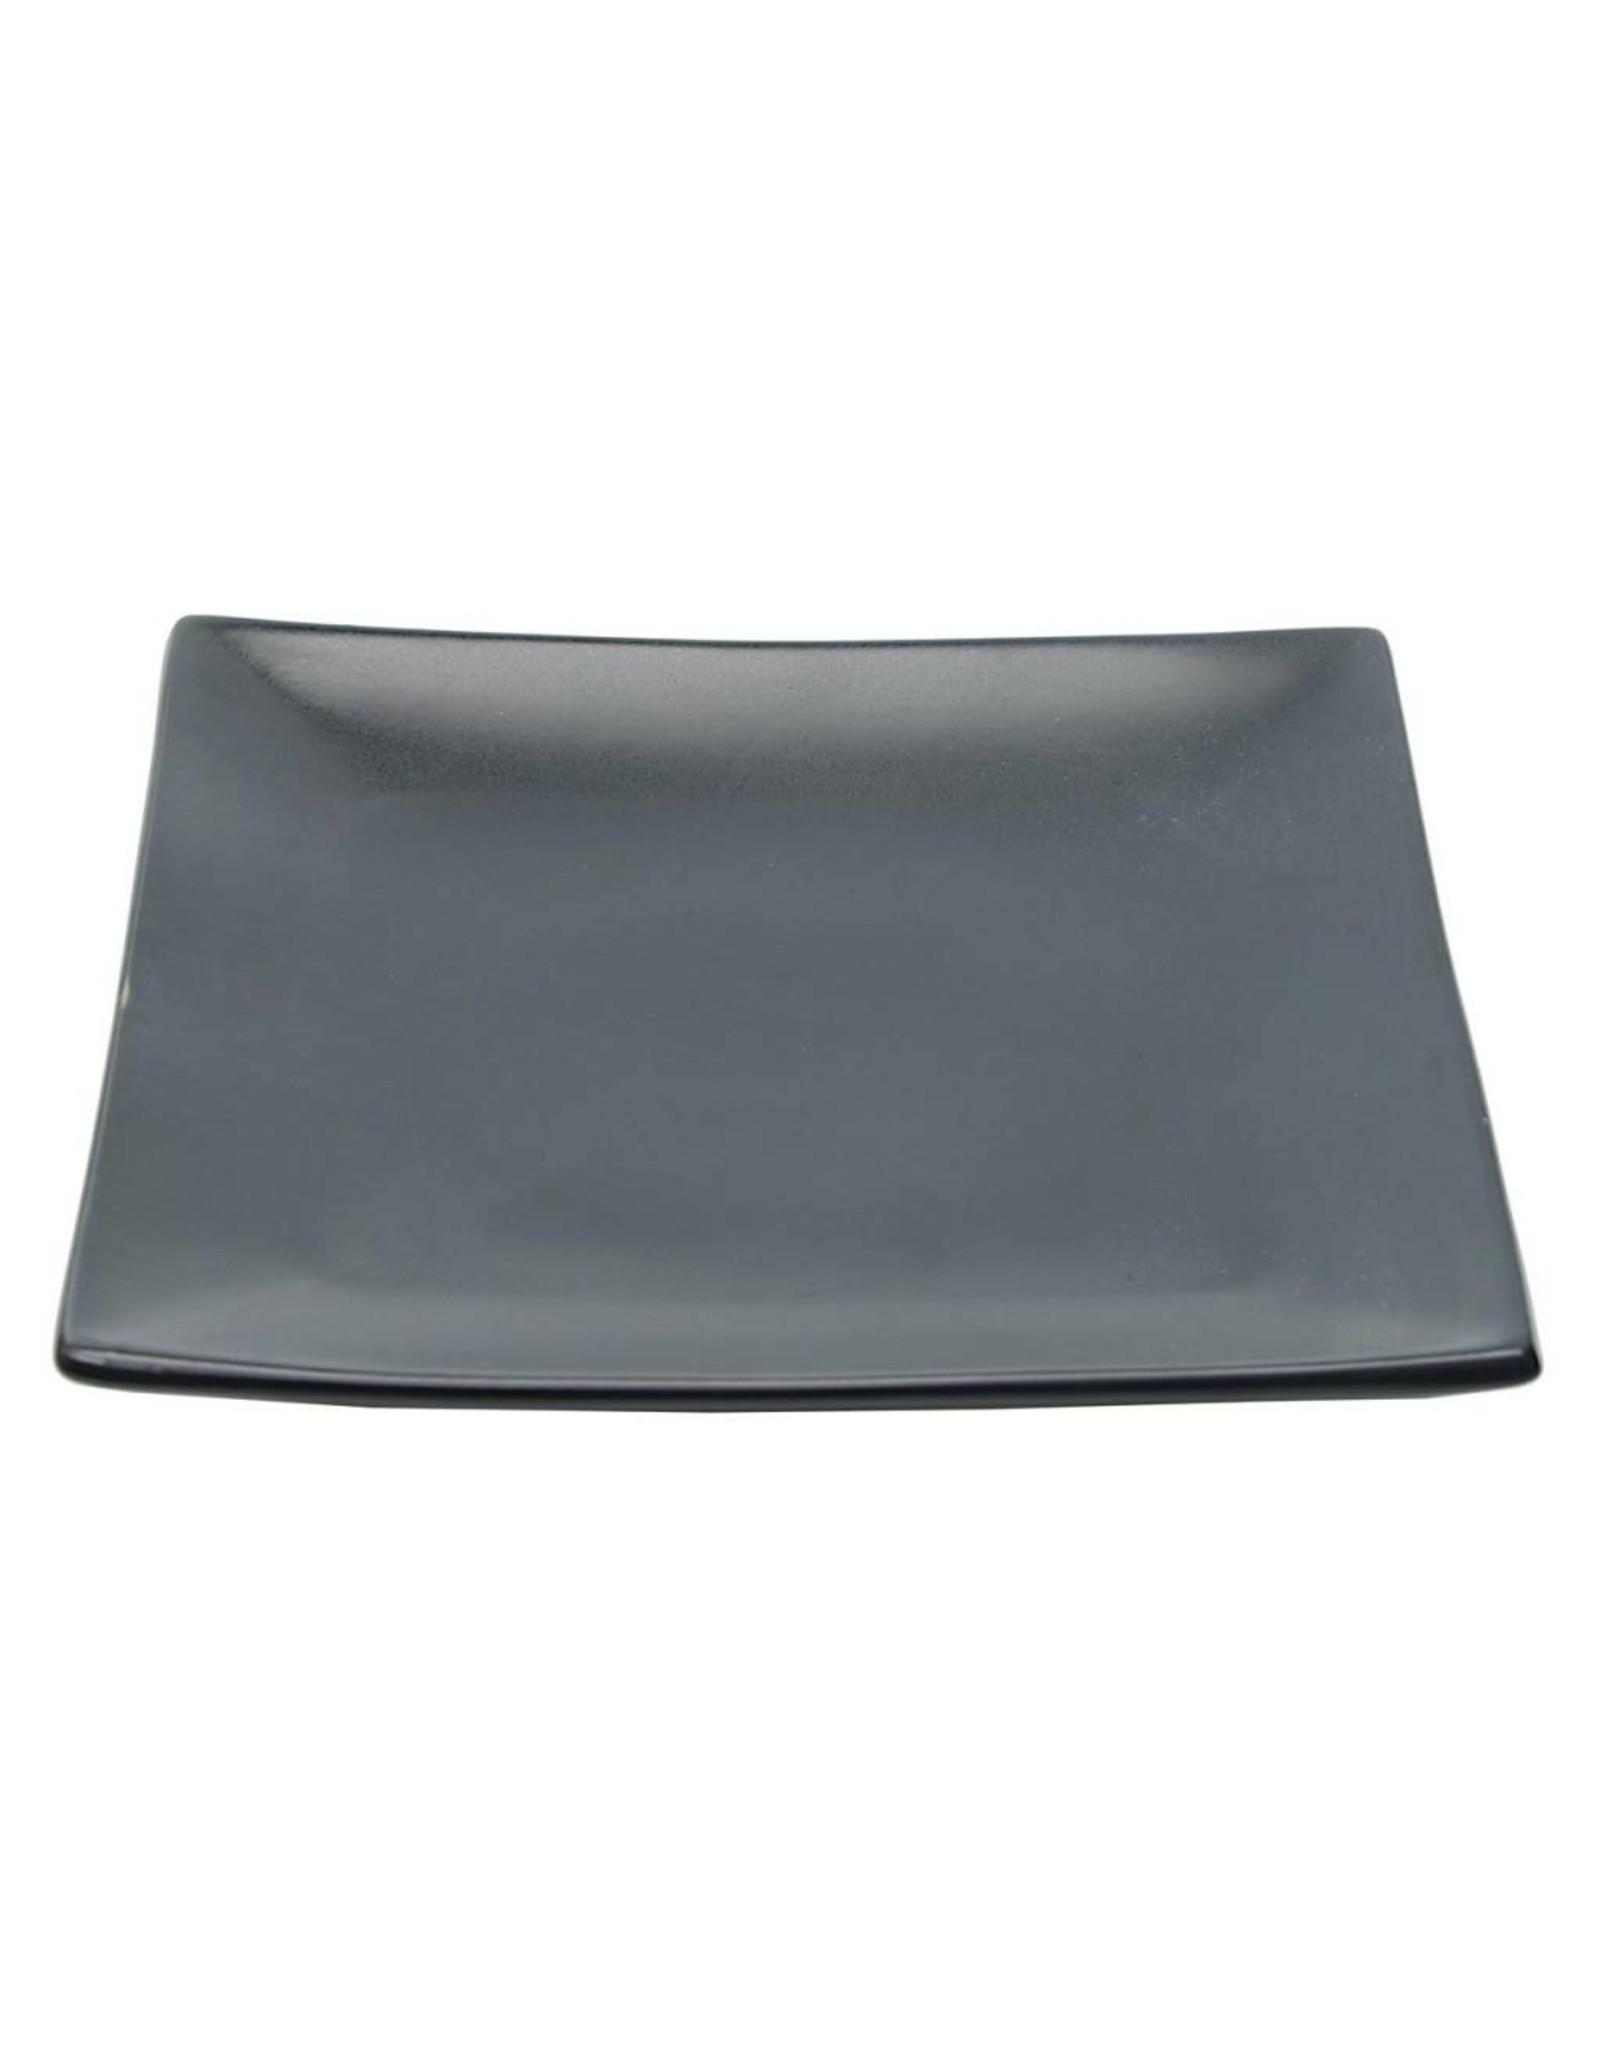 Tokyo Design Studio Black Series bord 20.5x20.5cm mat zwart